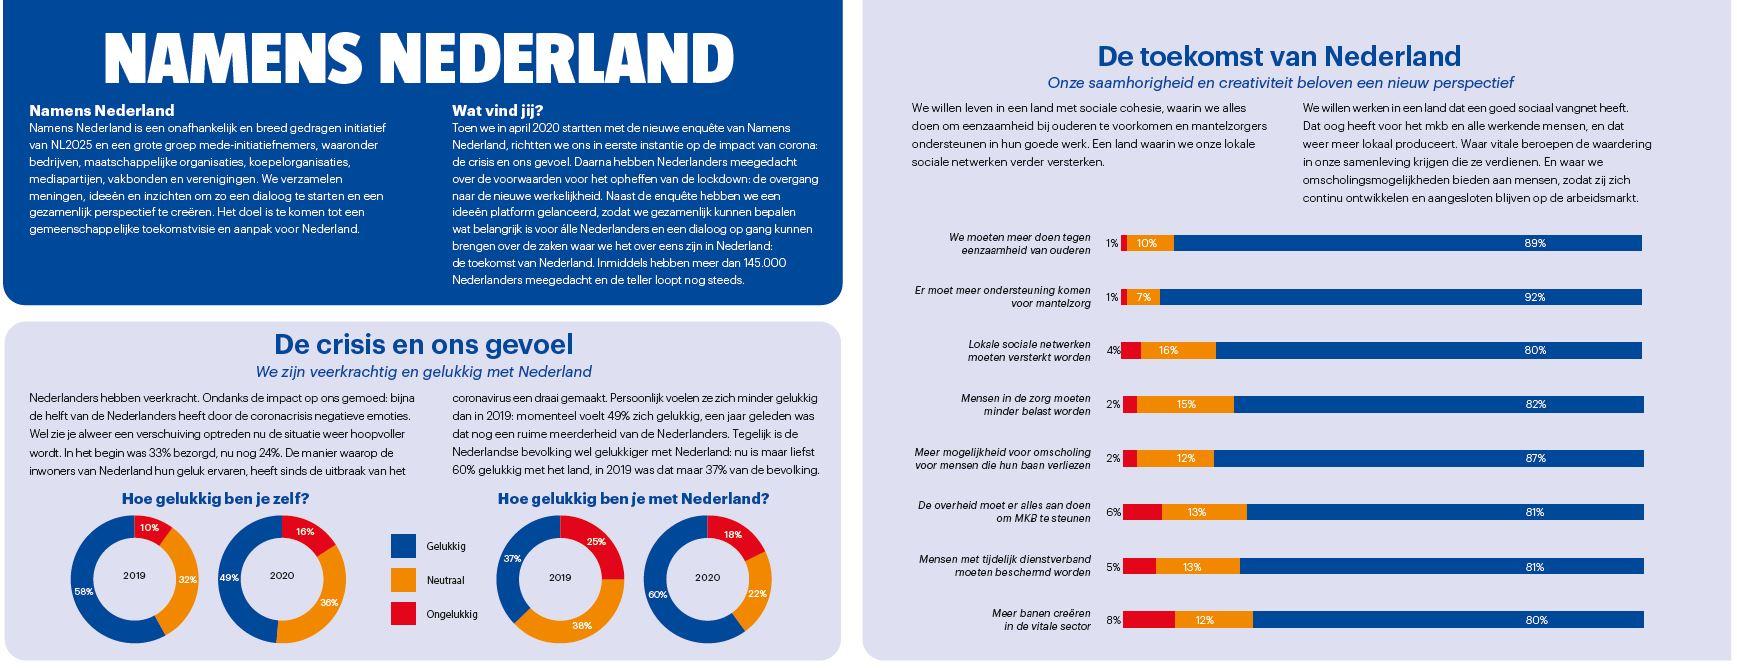 Namens Nederlands McKinsey SKIM conjoint survey